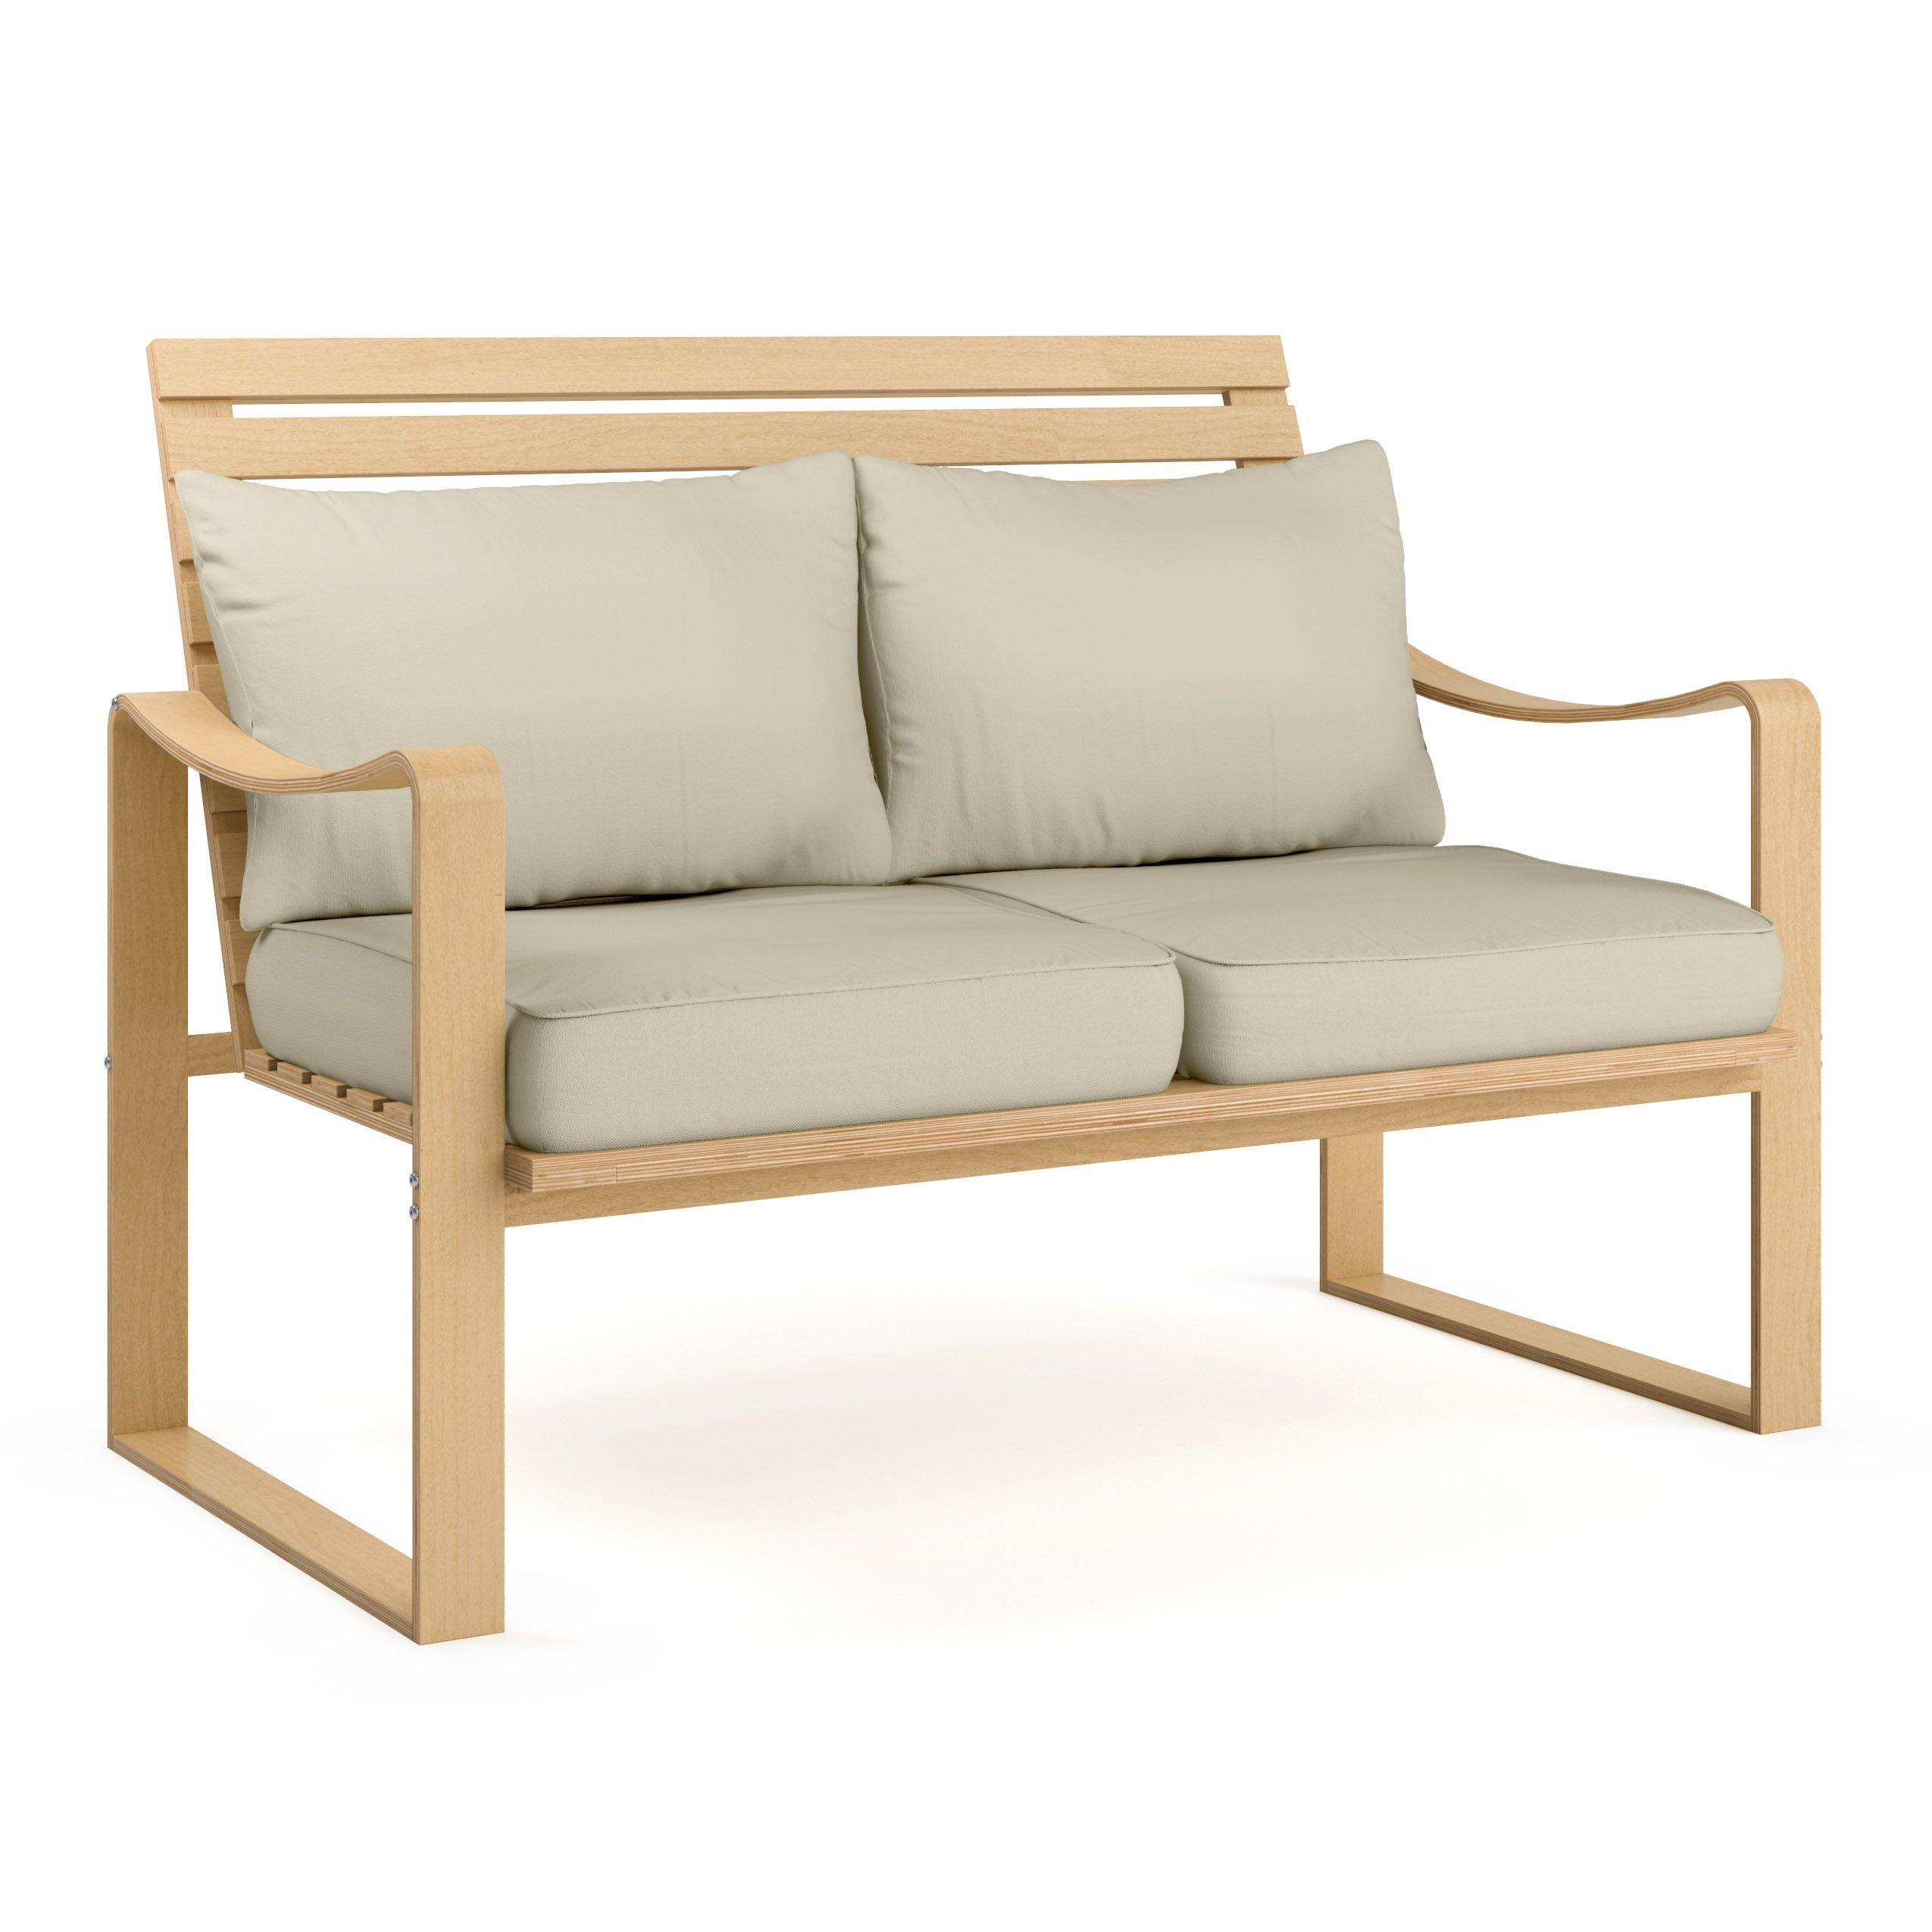 CorLiving LCQ-867-S Aquios Bentwood Sofa, Warm White